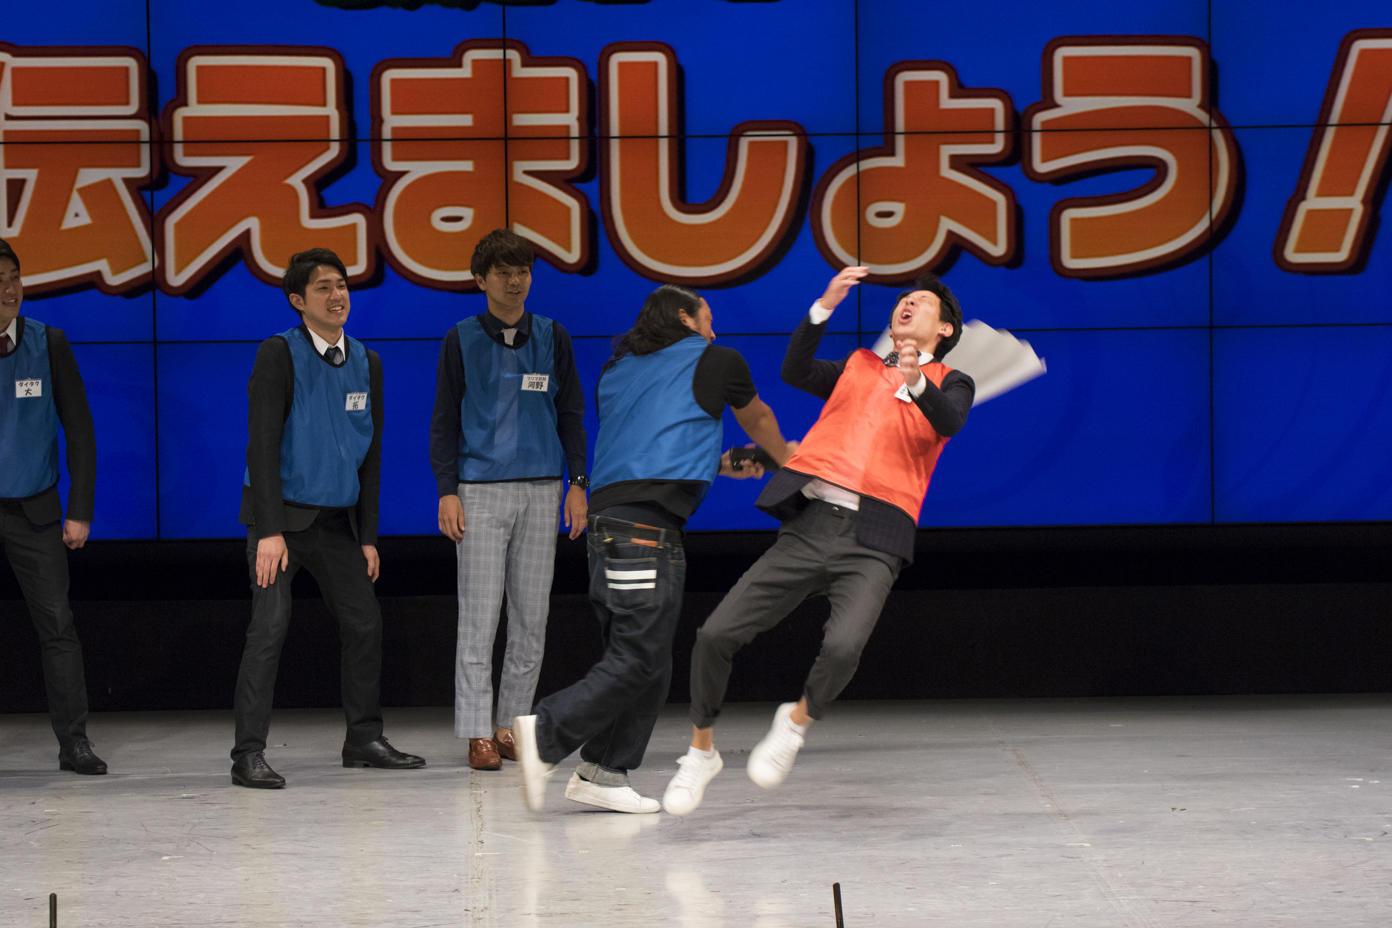 http://news.yoshimoto.co.jp/20160824233139-9d08d0b9e13f60941dafb44a8c307d84dbdaf9c5.jpg